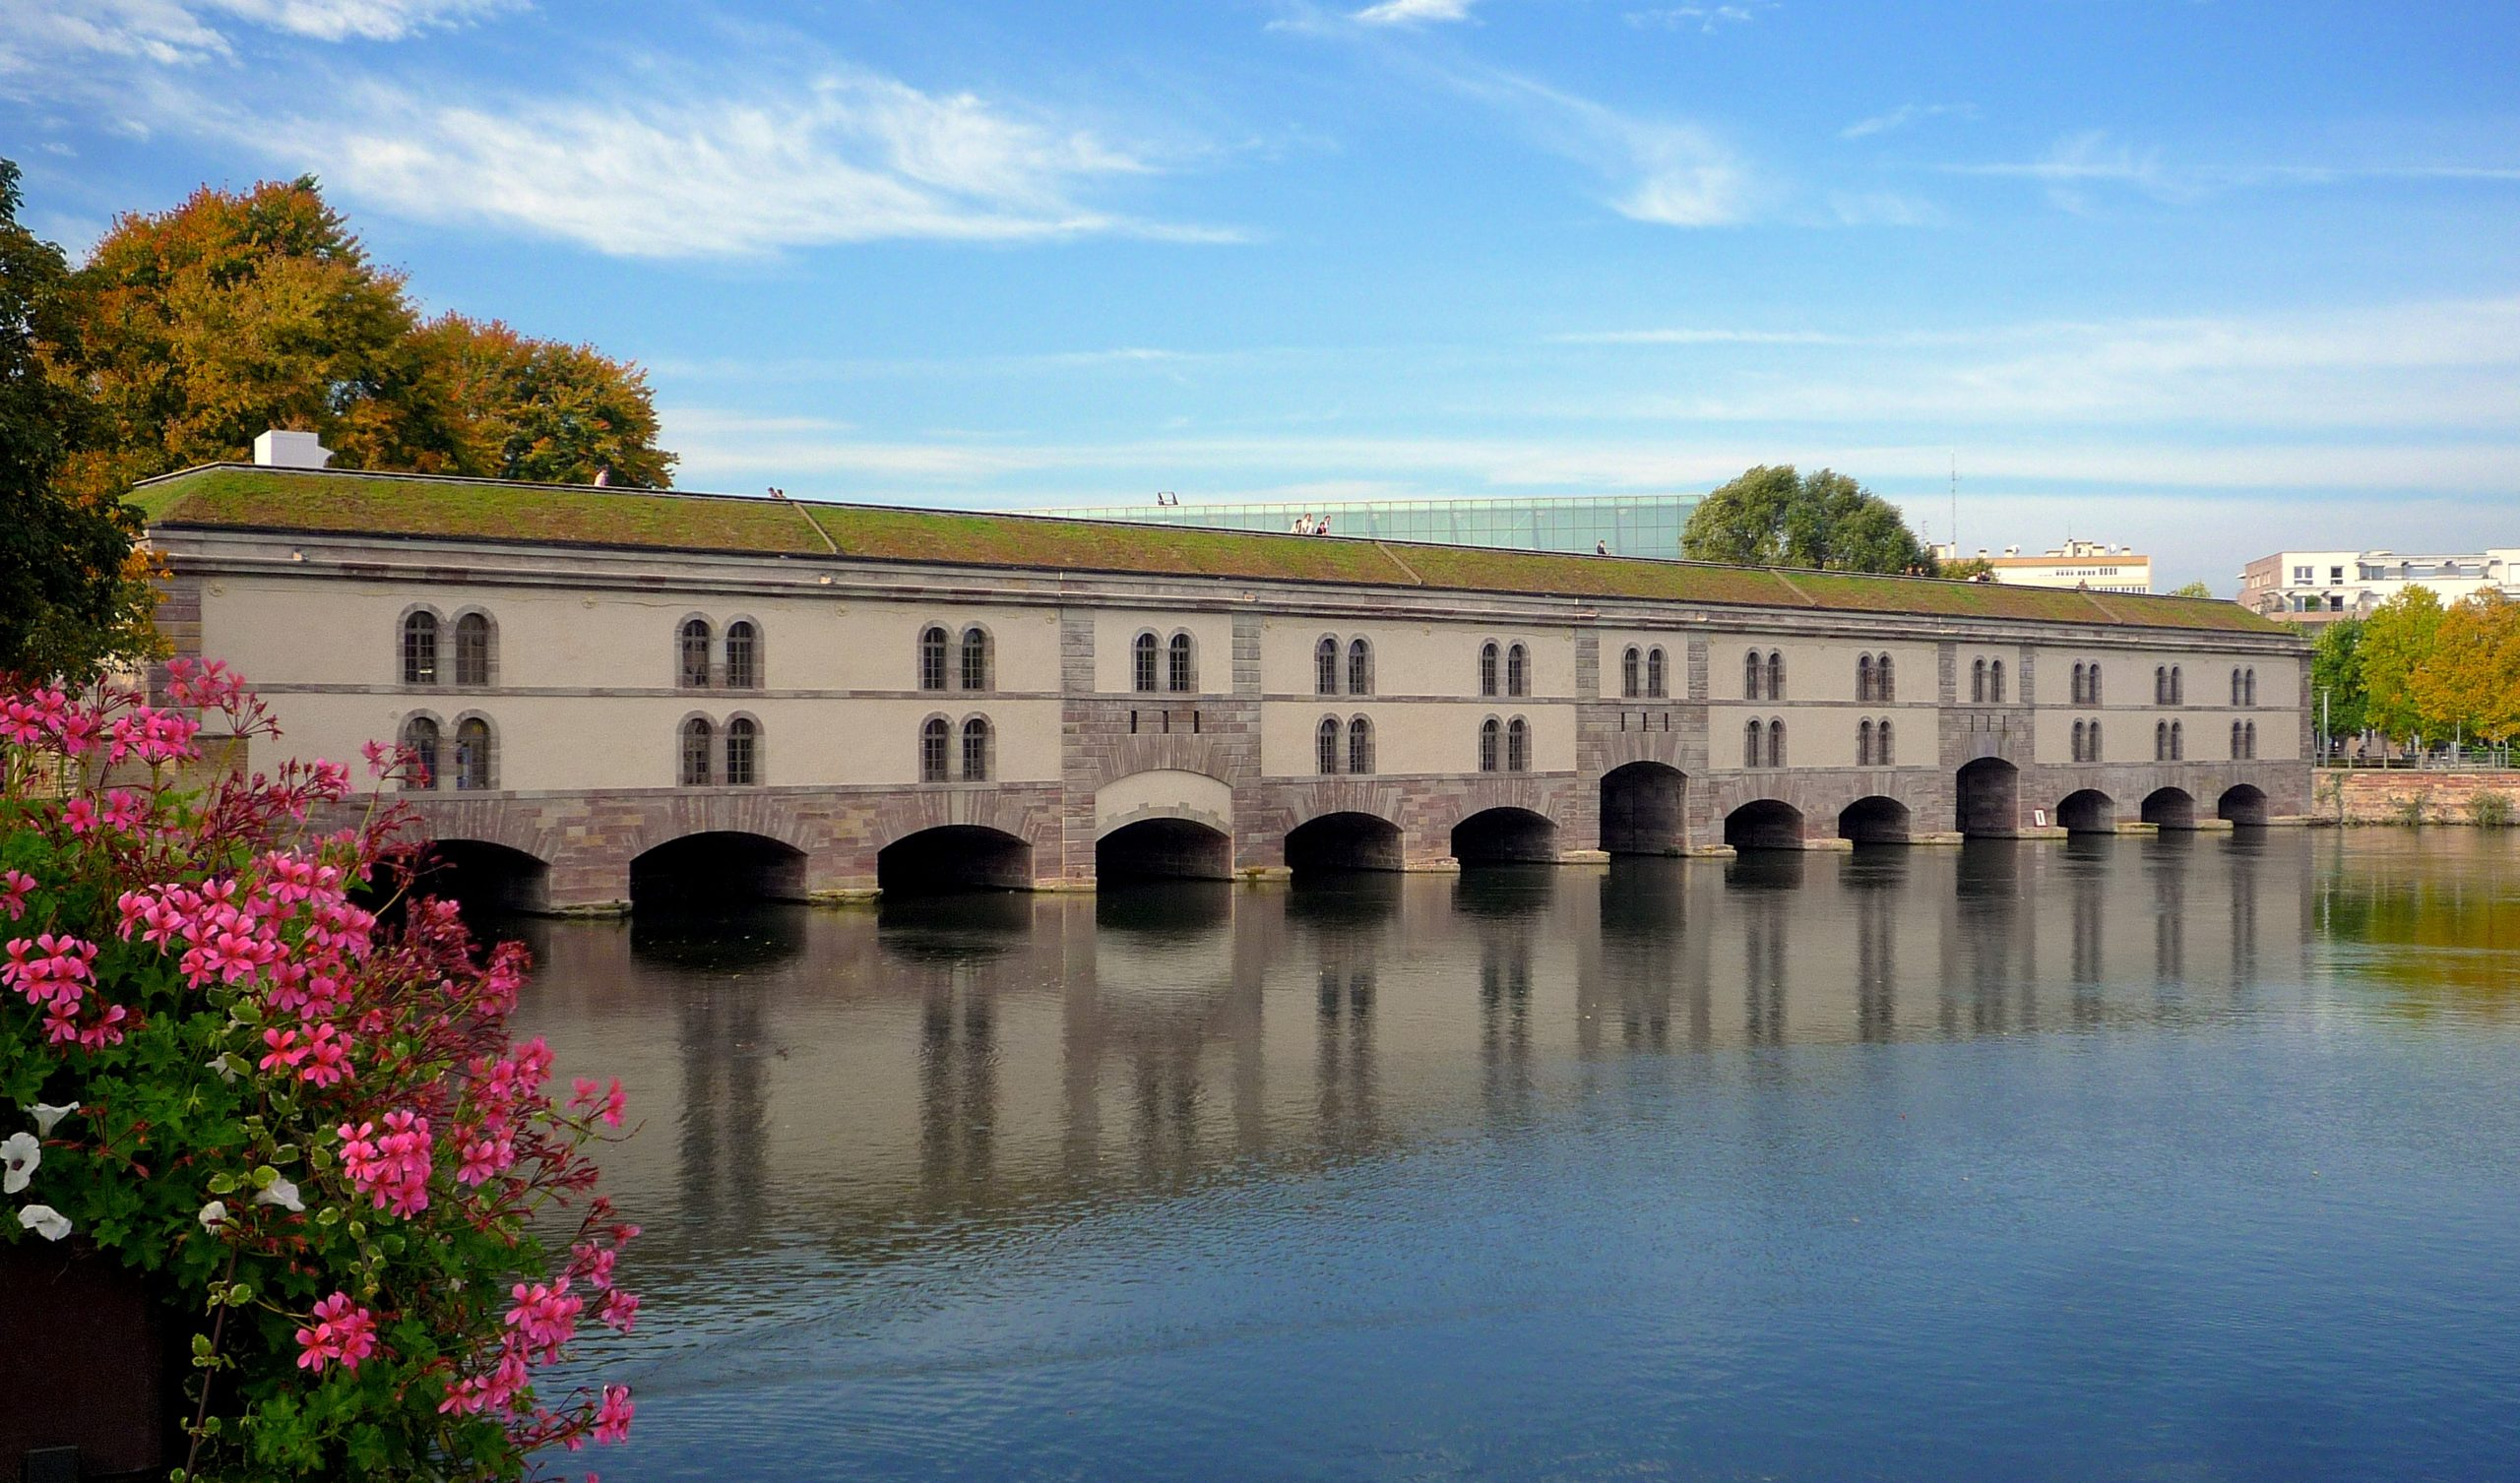 Strasbourg Barrage Vauban Après Restauration 2012 01